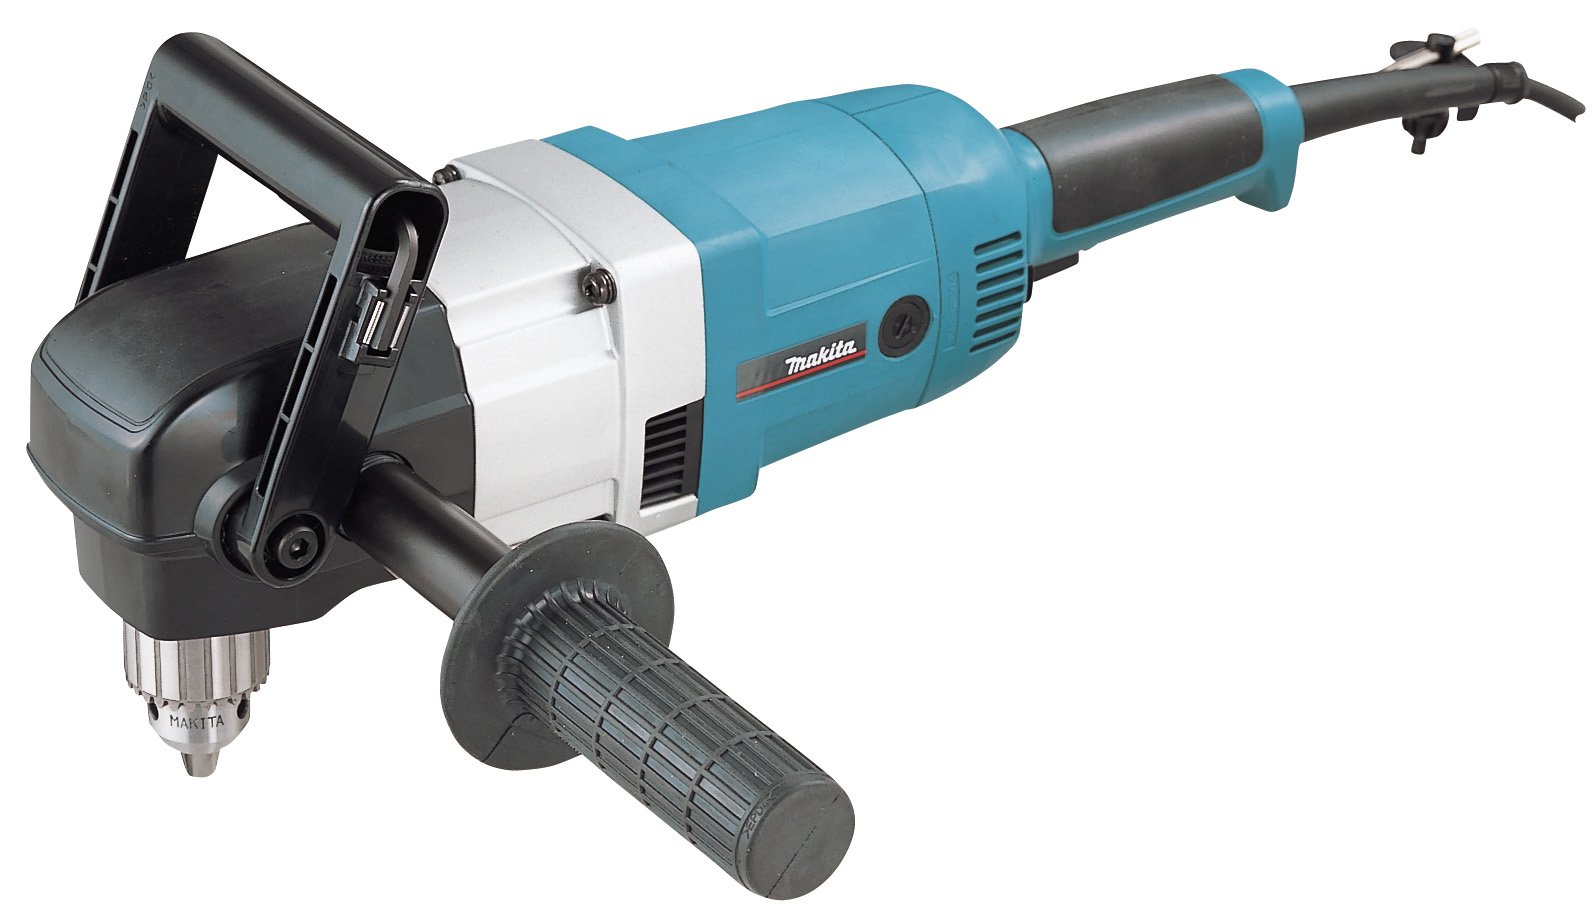 Makita-DA4031-Winkelbohrmaschine-1050-W